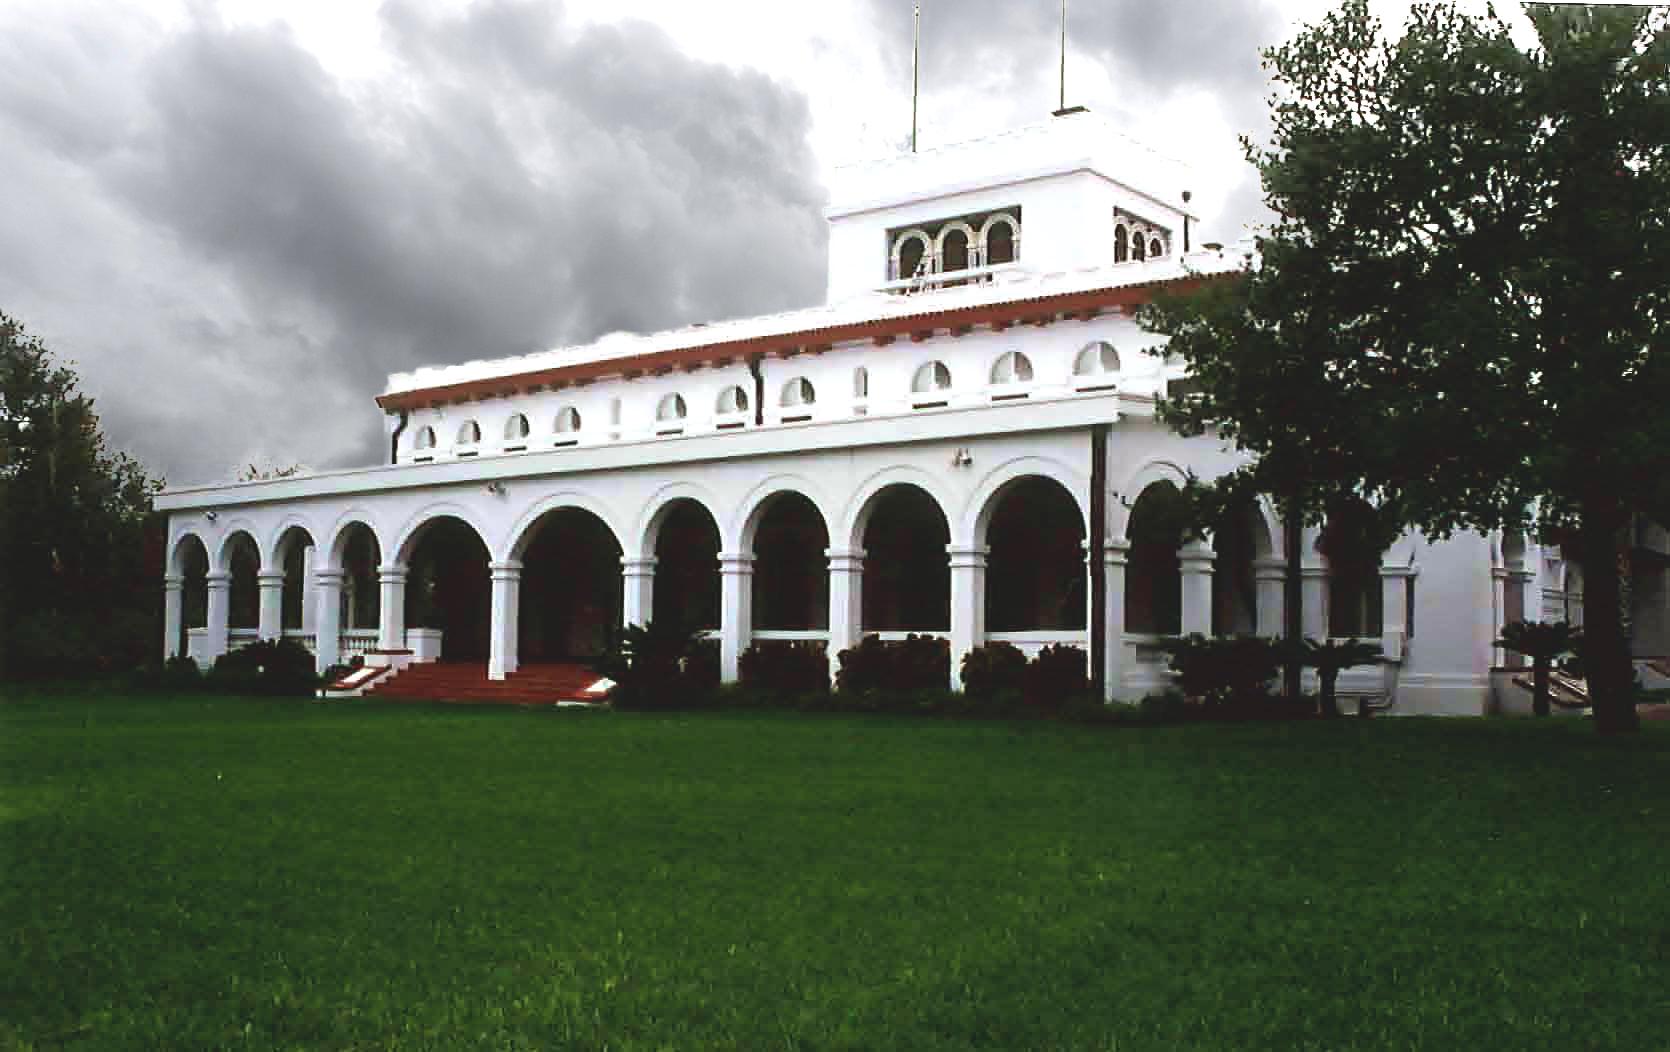 King Ranch Residence